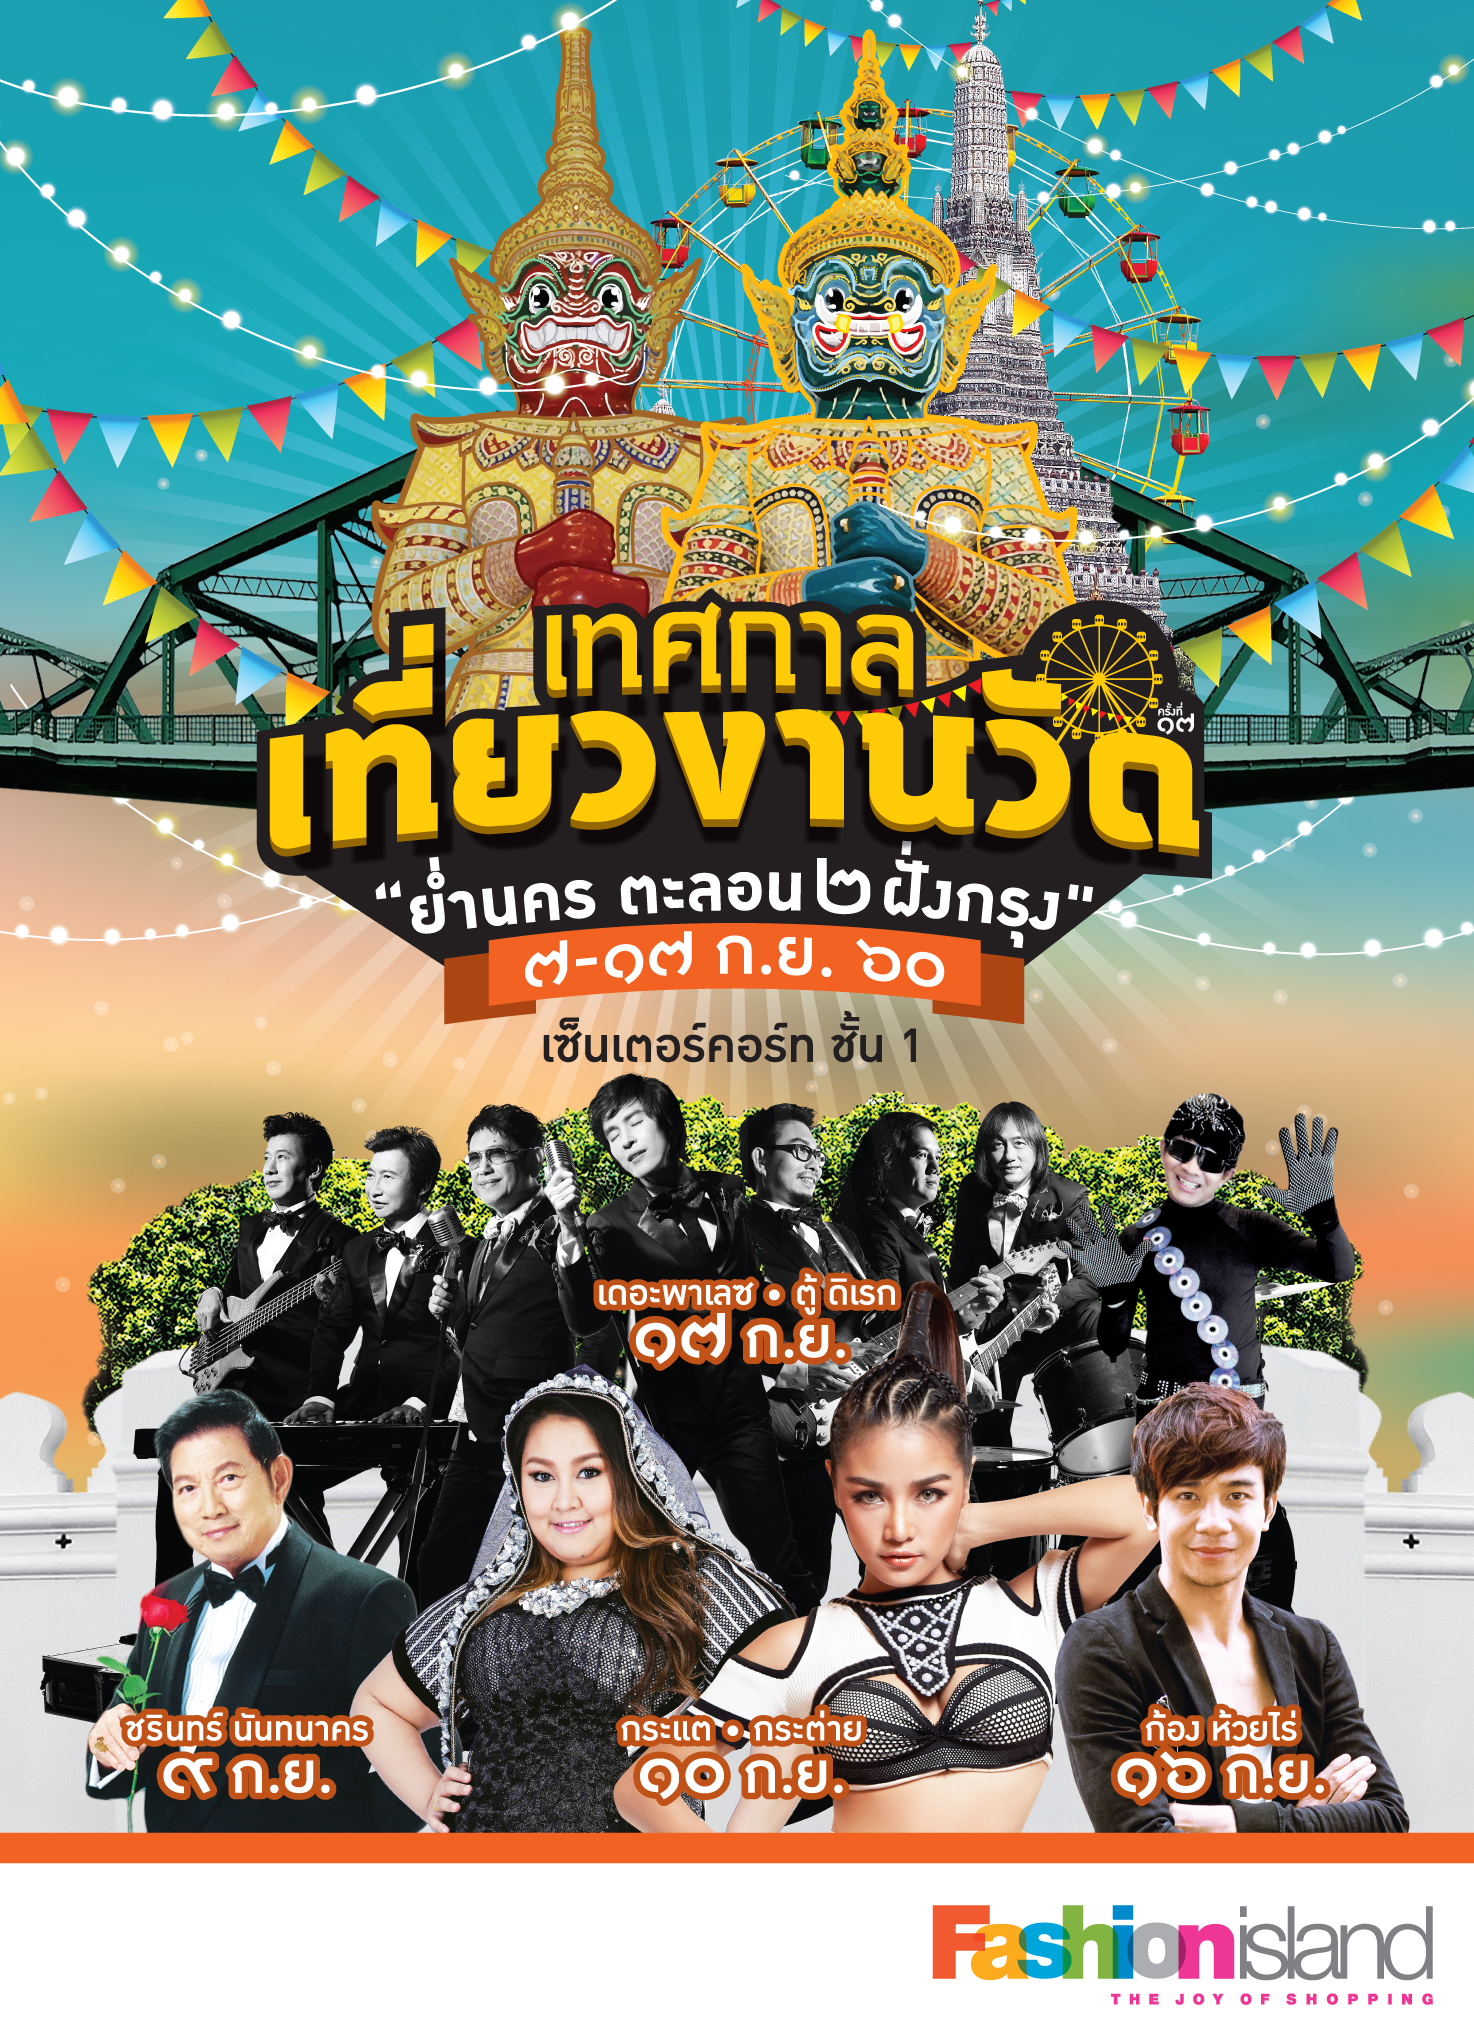 Poster-52x72-cm.ai2